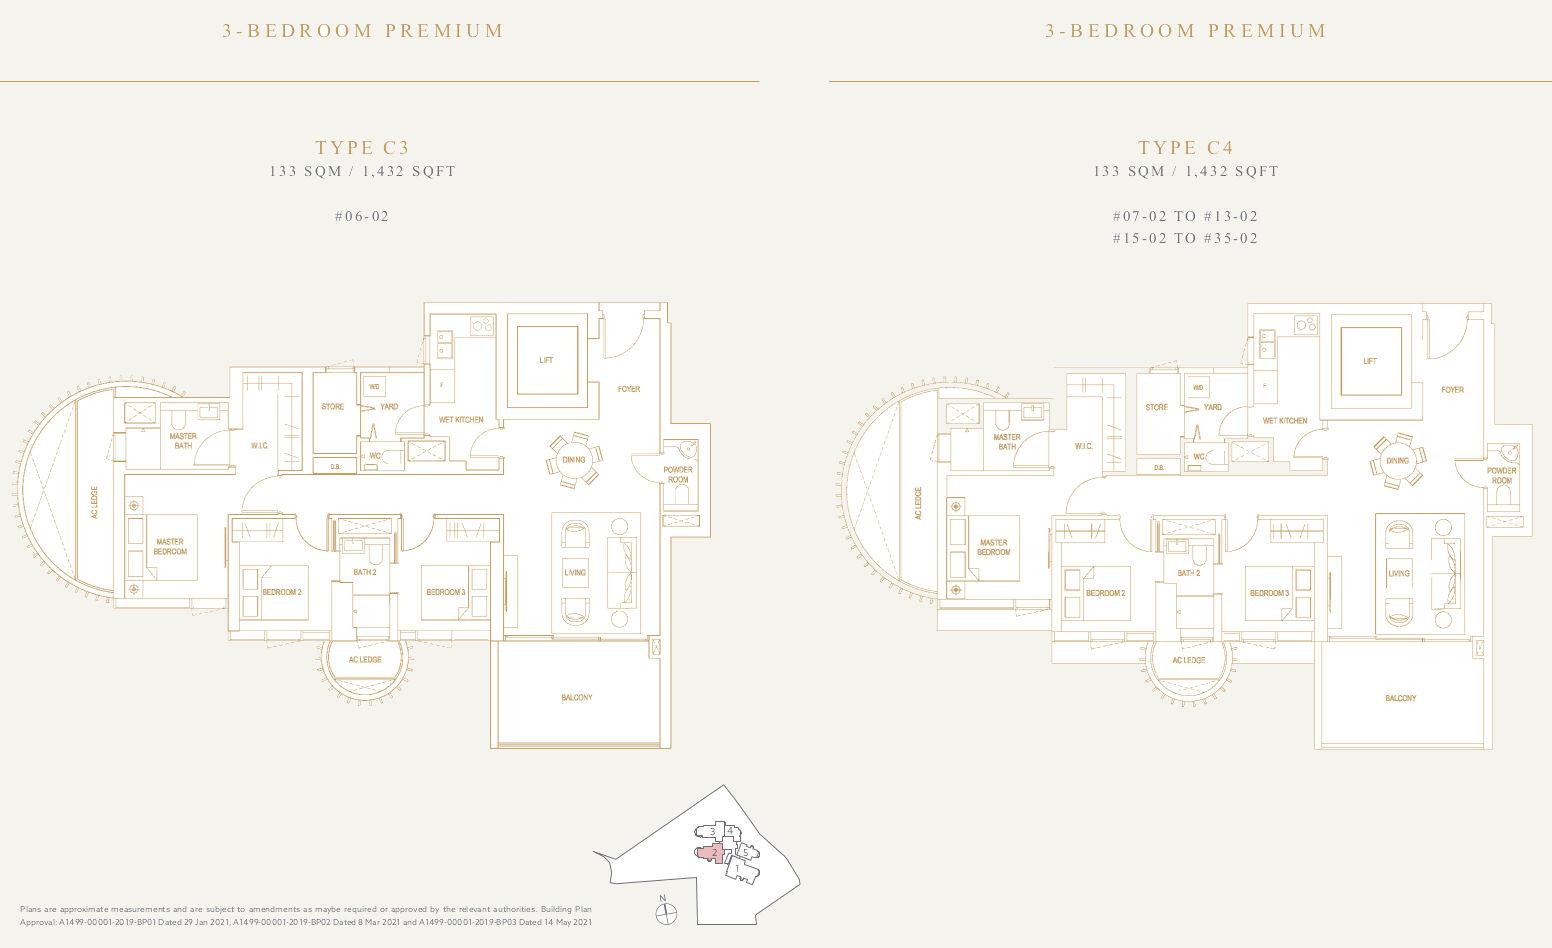 Klimt Cairnhill Floor Plans . 3BR Premium type C3